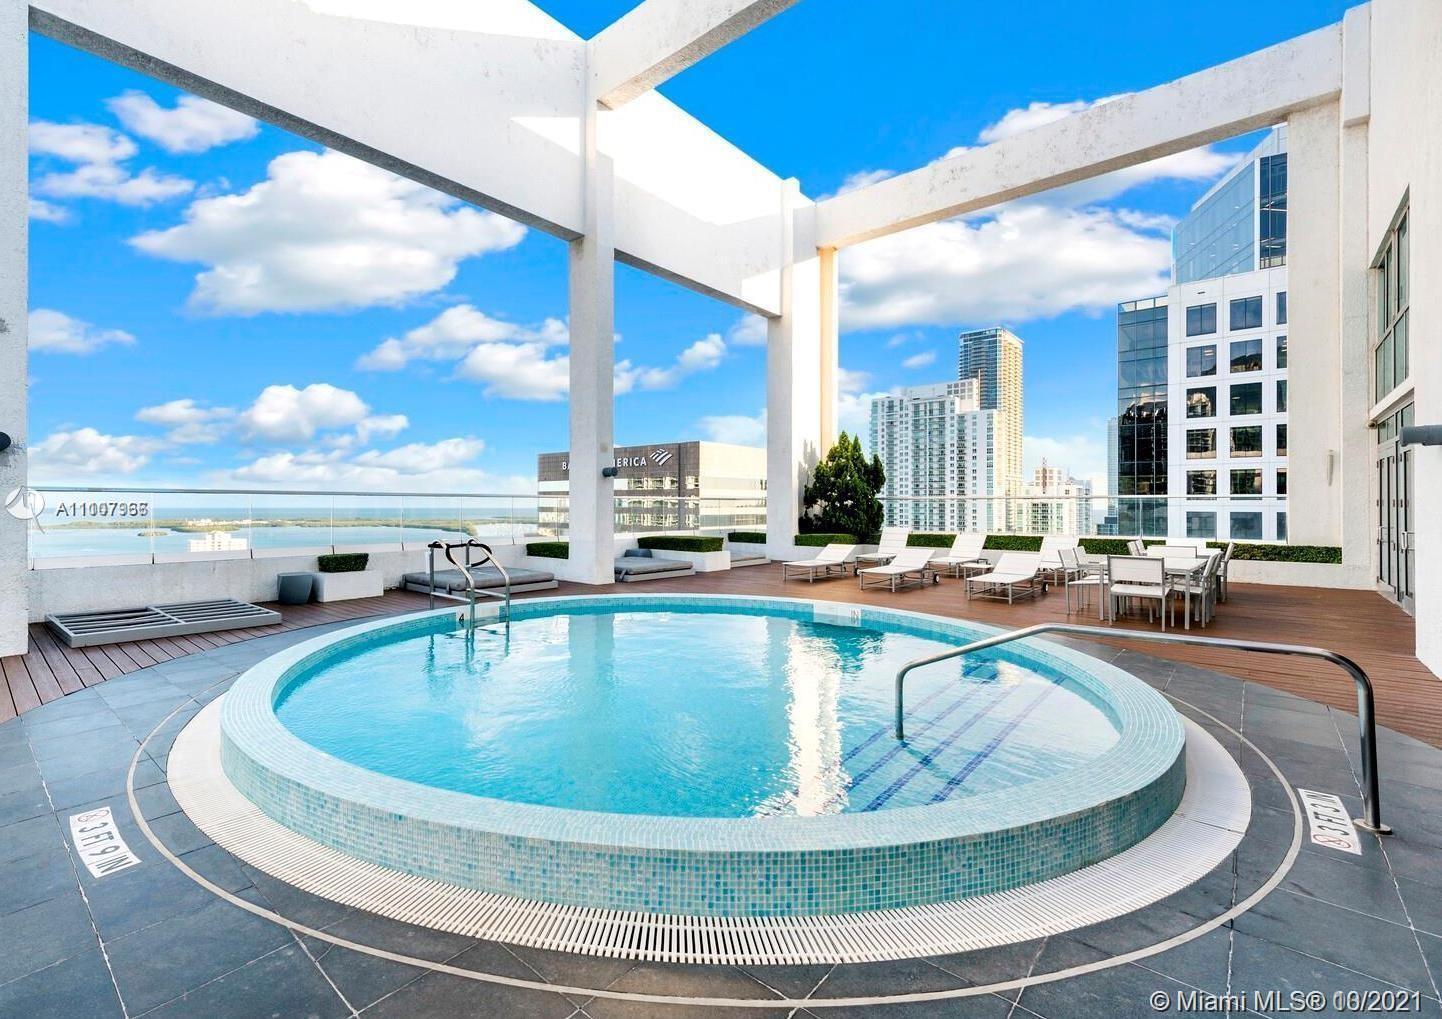 500 Brickell East Tower #2105 - 55 SE 6th St #2105, Miami, FL 33131